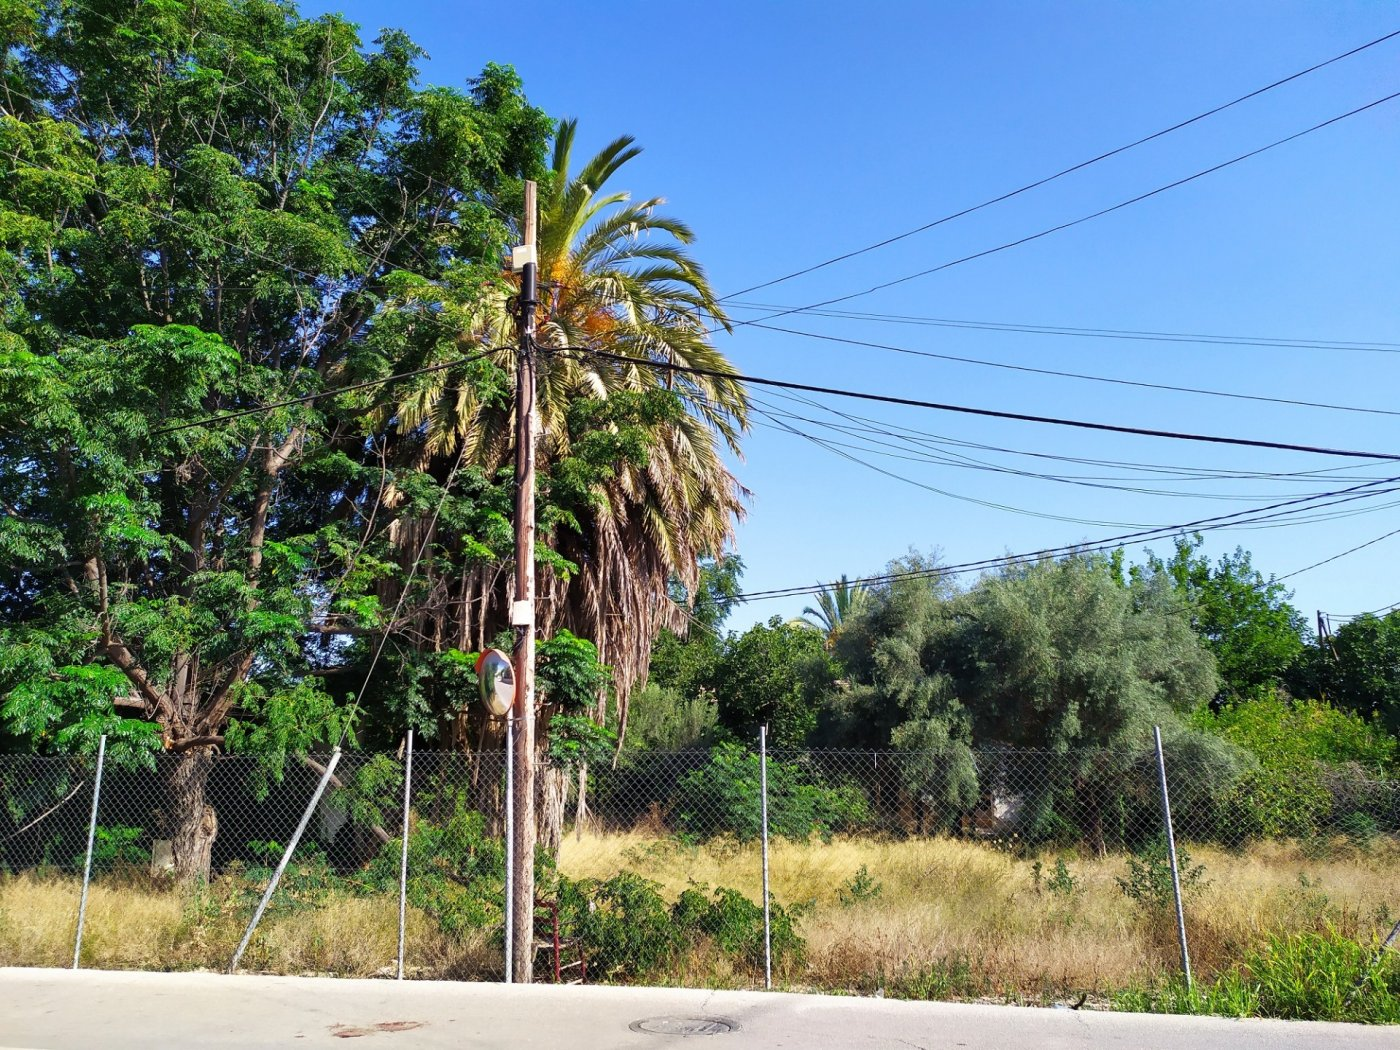 Gran terreno urbanizable en la arboleja - imagenInmueble4